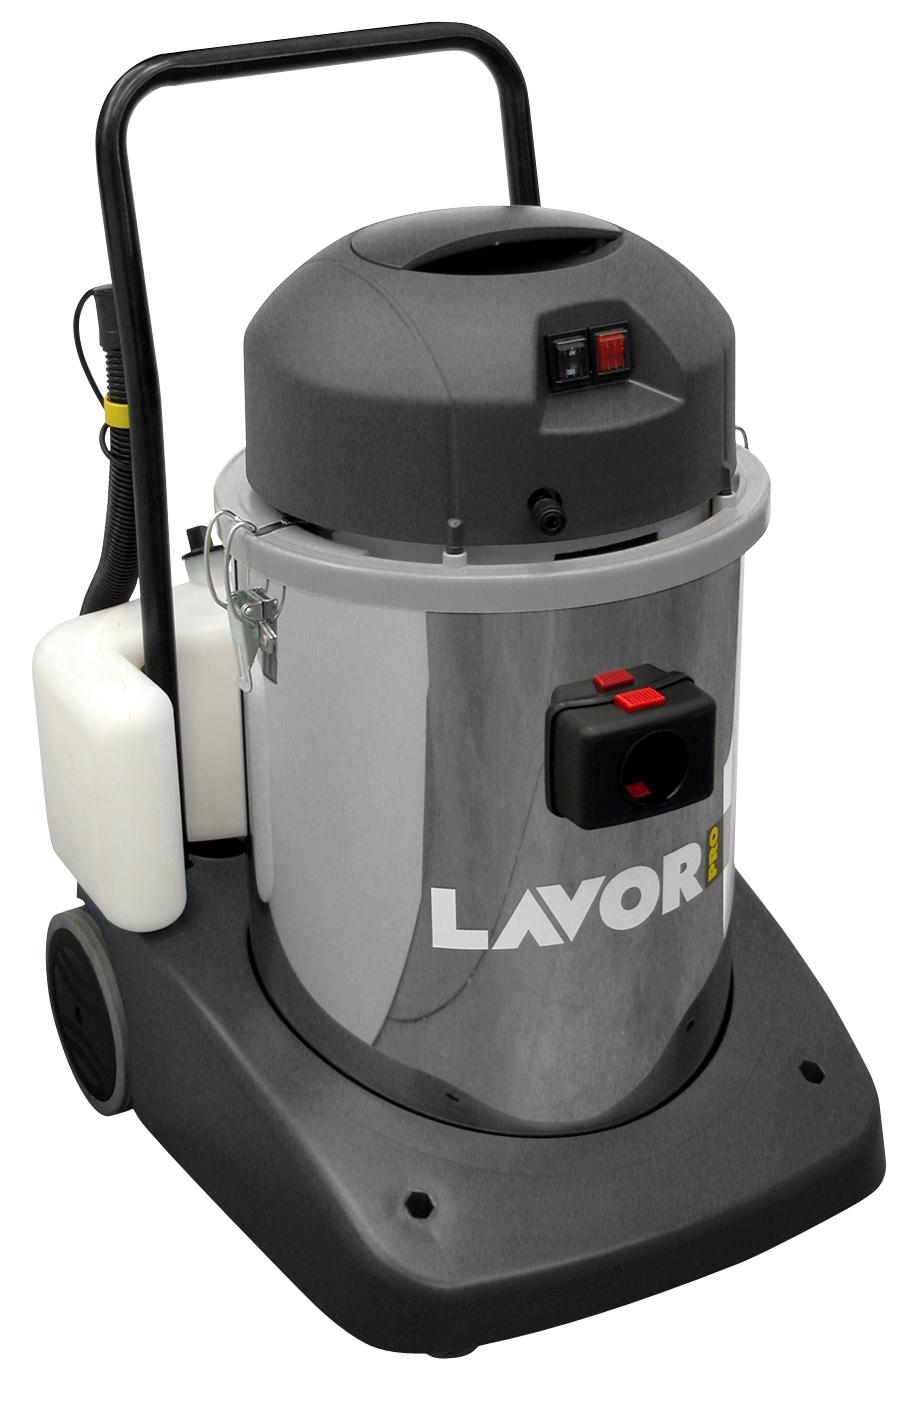 Extraktor LAVOR APL 1400